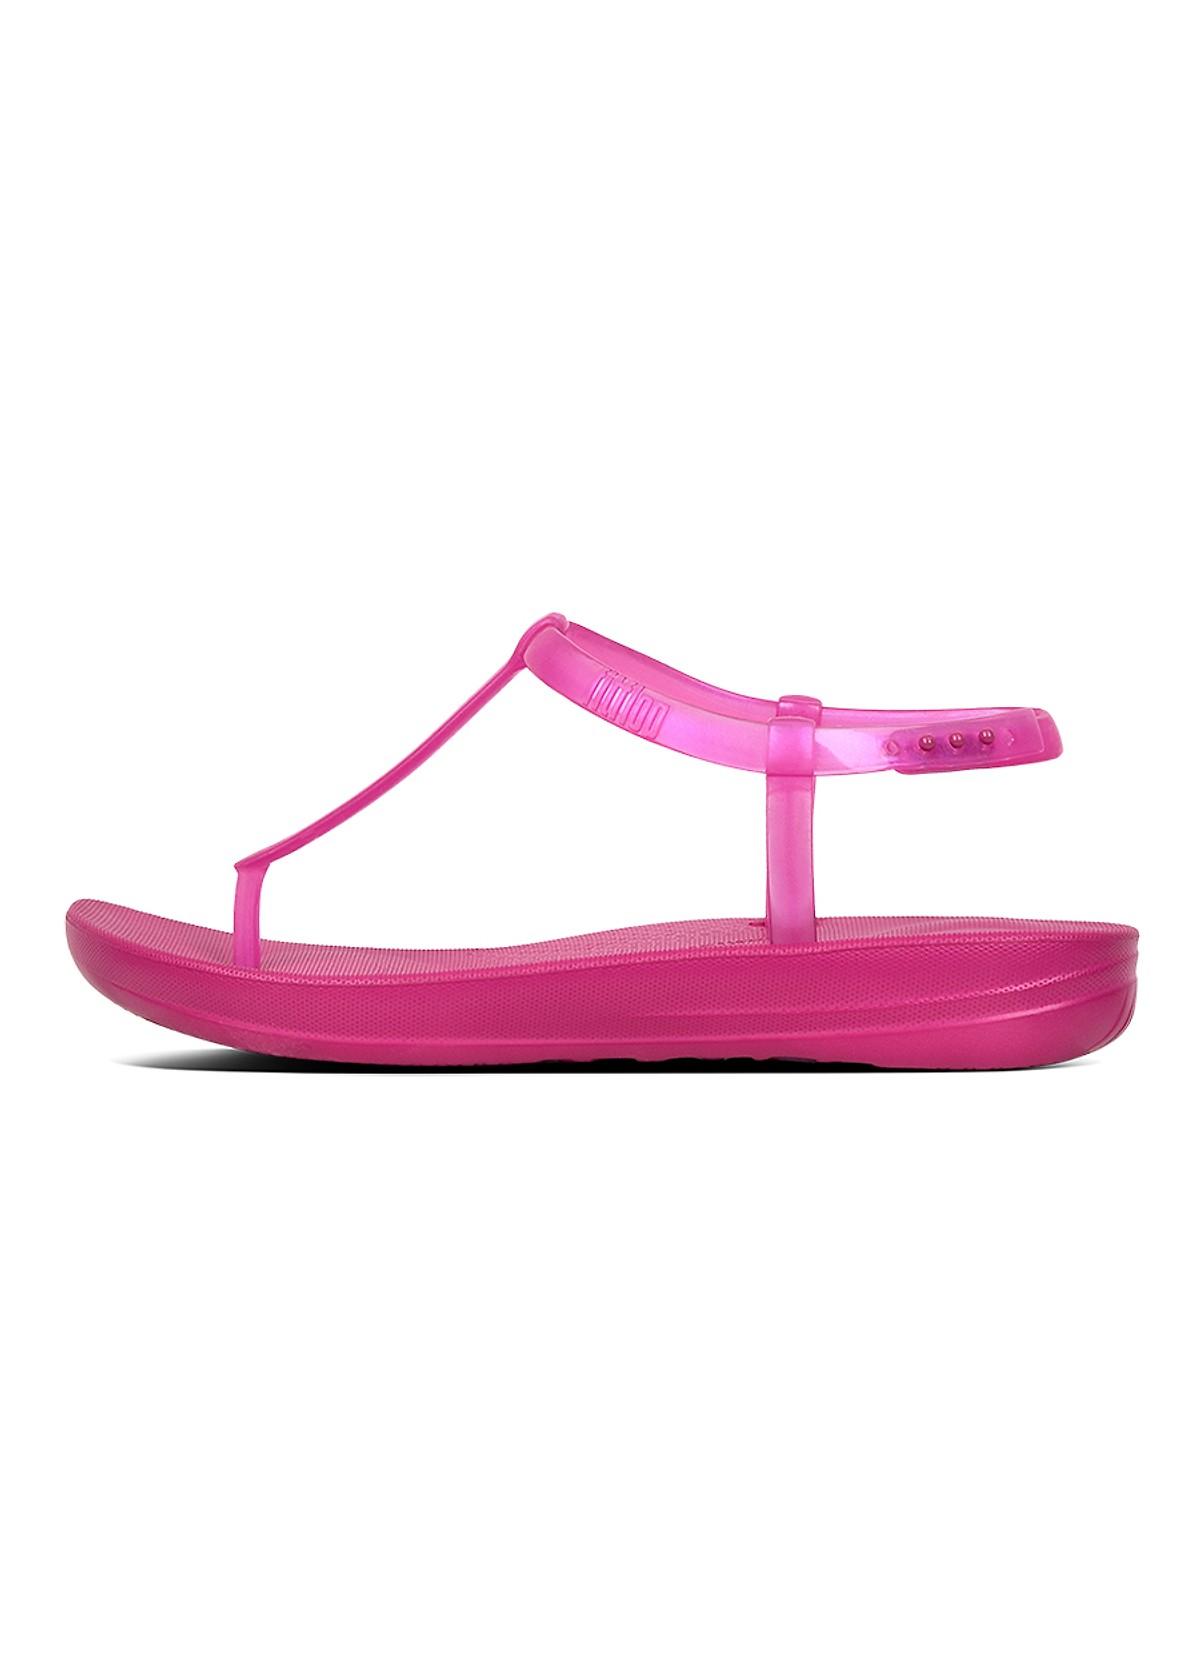 Giày Sandal Nữ Fitflop R09